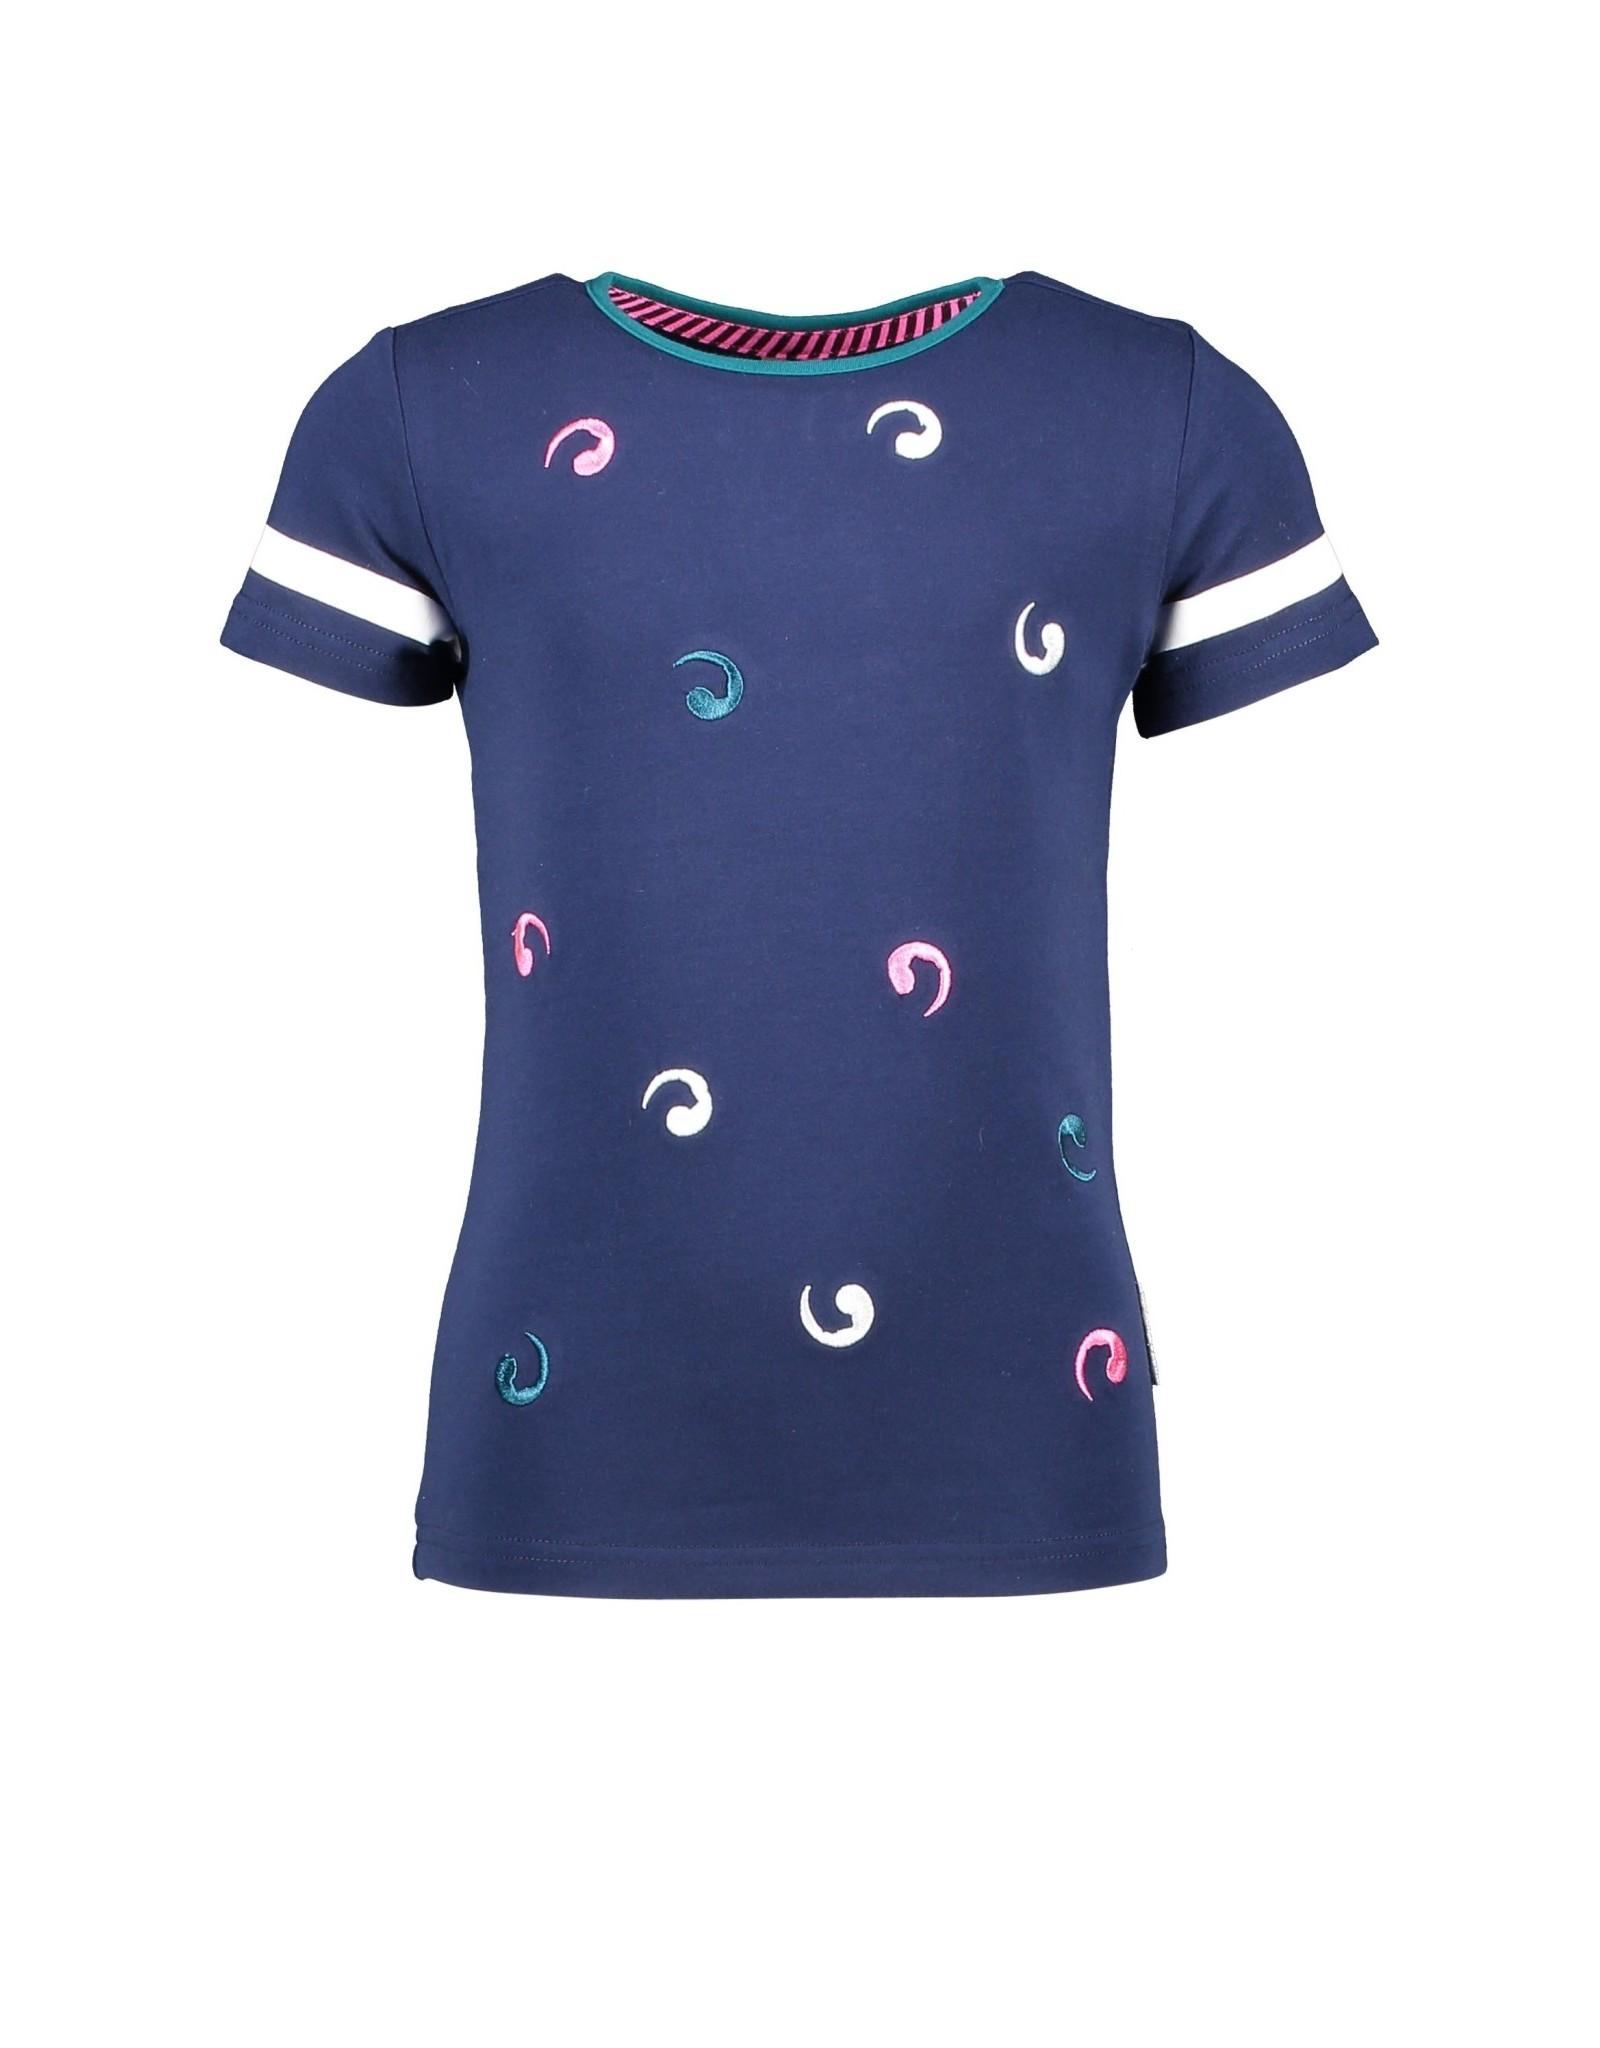 B.Nosy B.Nosy meisjes t-shirt circles Space Blue